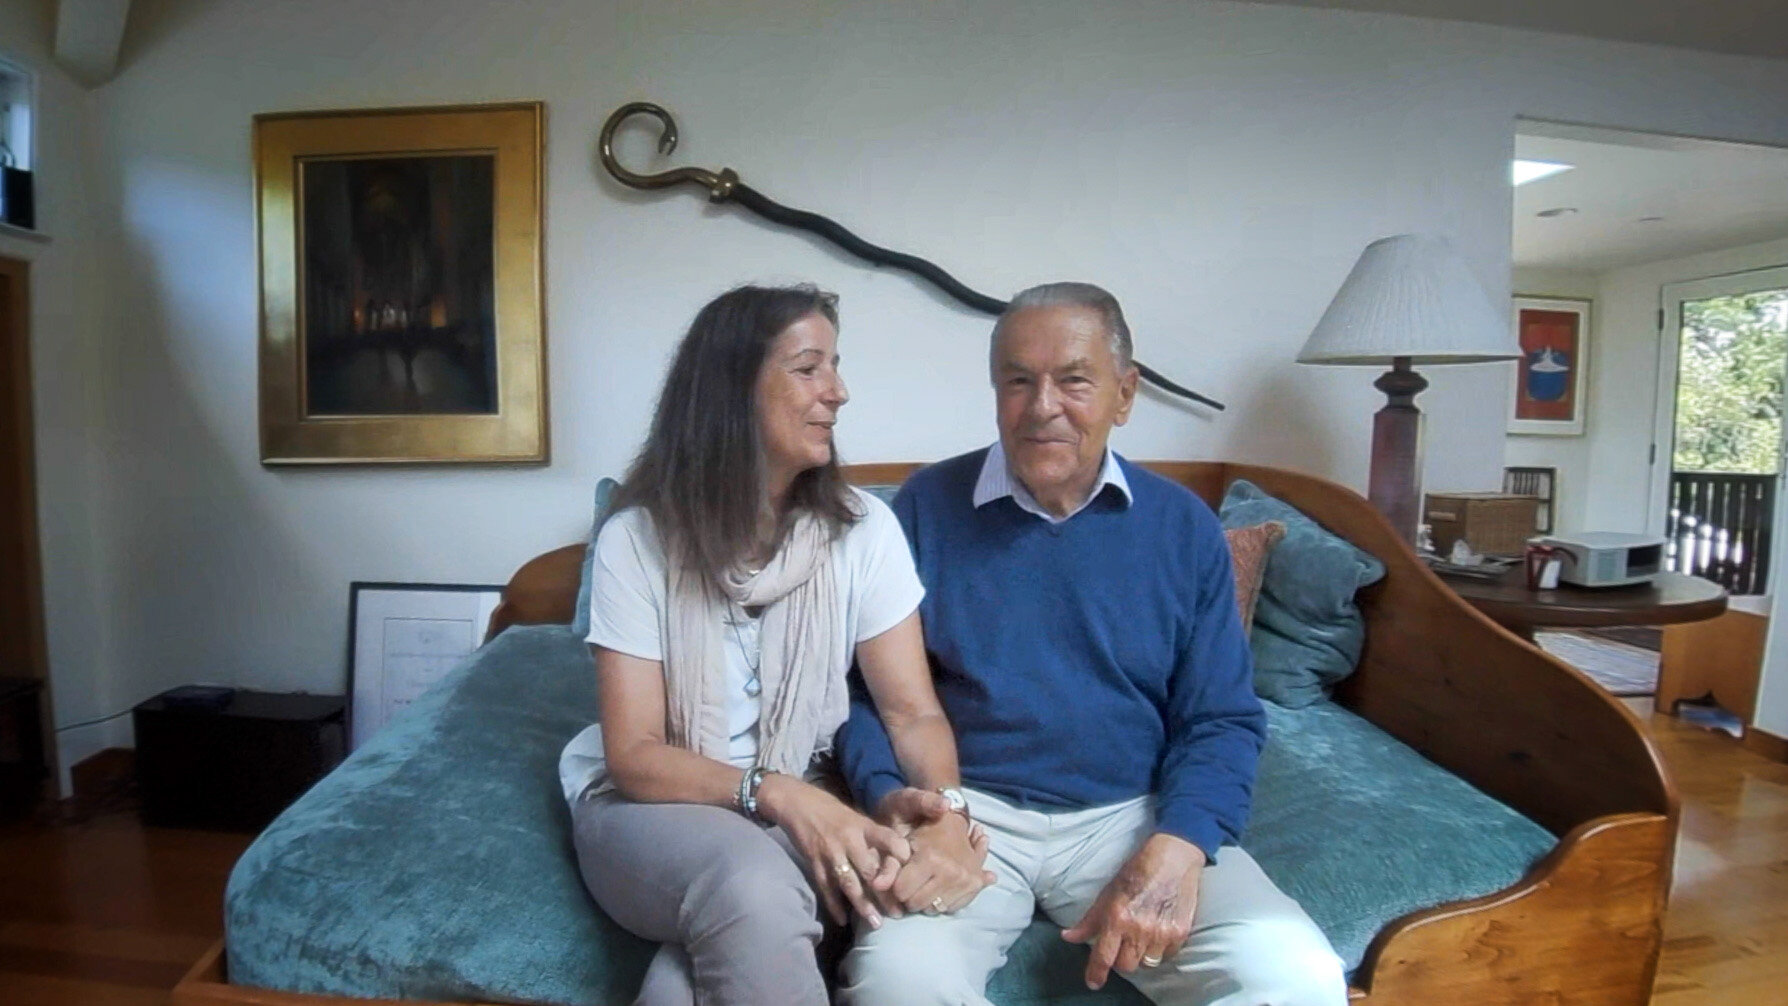 Stan and Brigitte Grof - On Stan's stroke  (17:55)